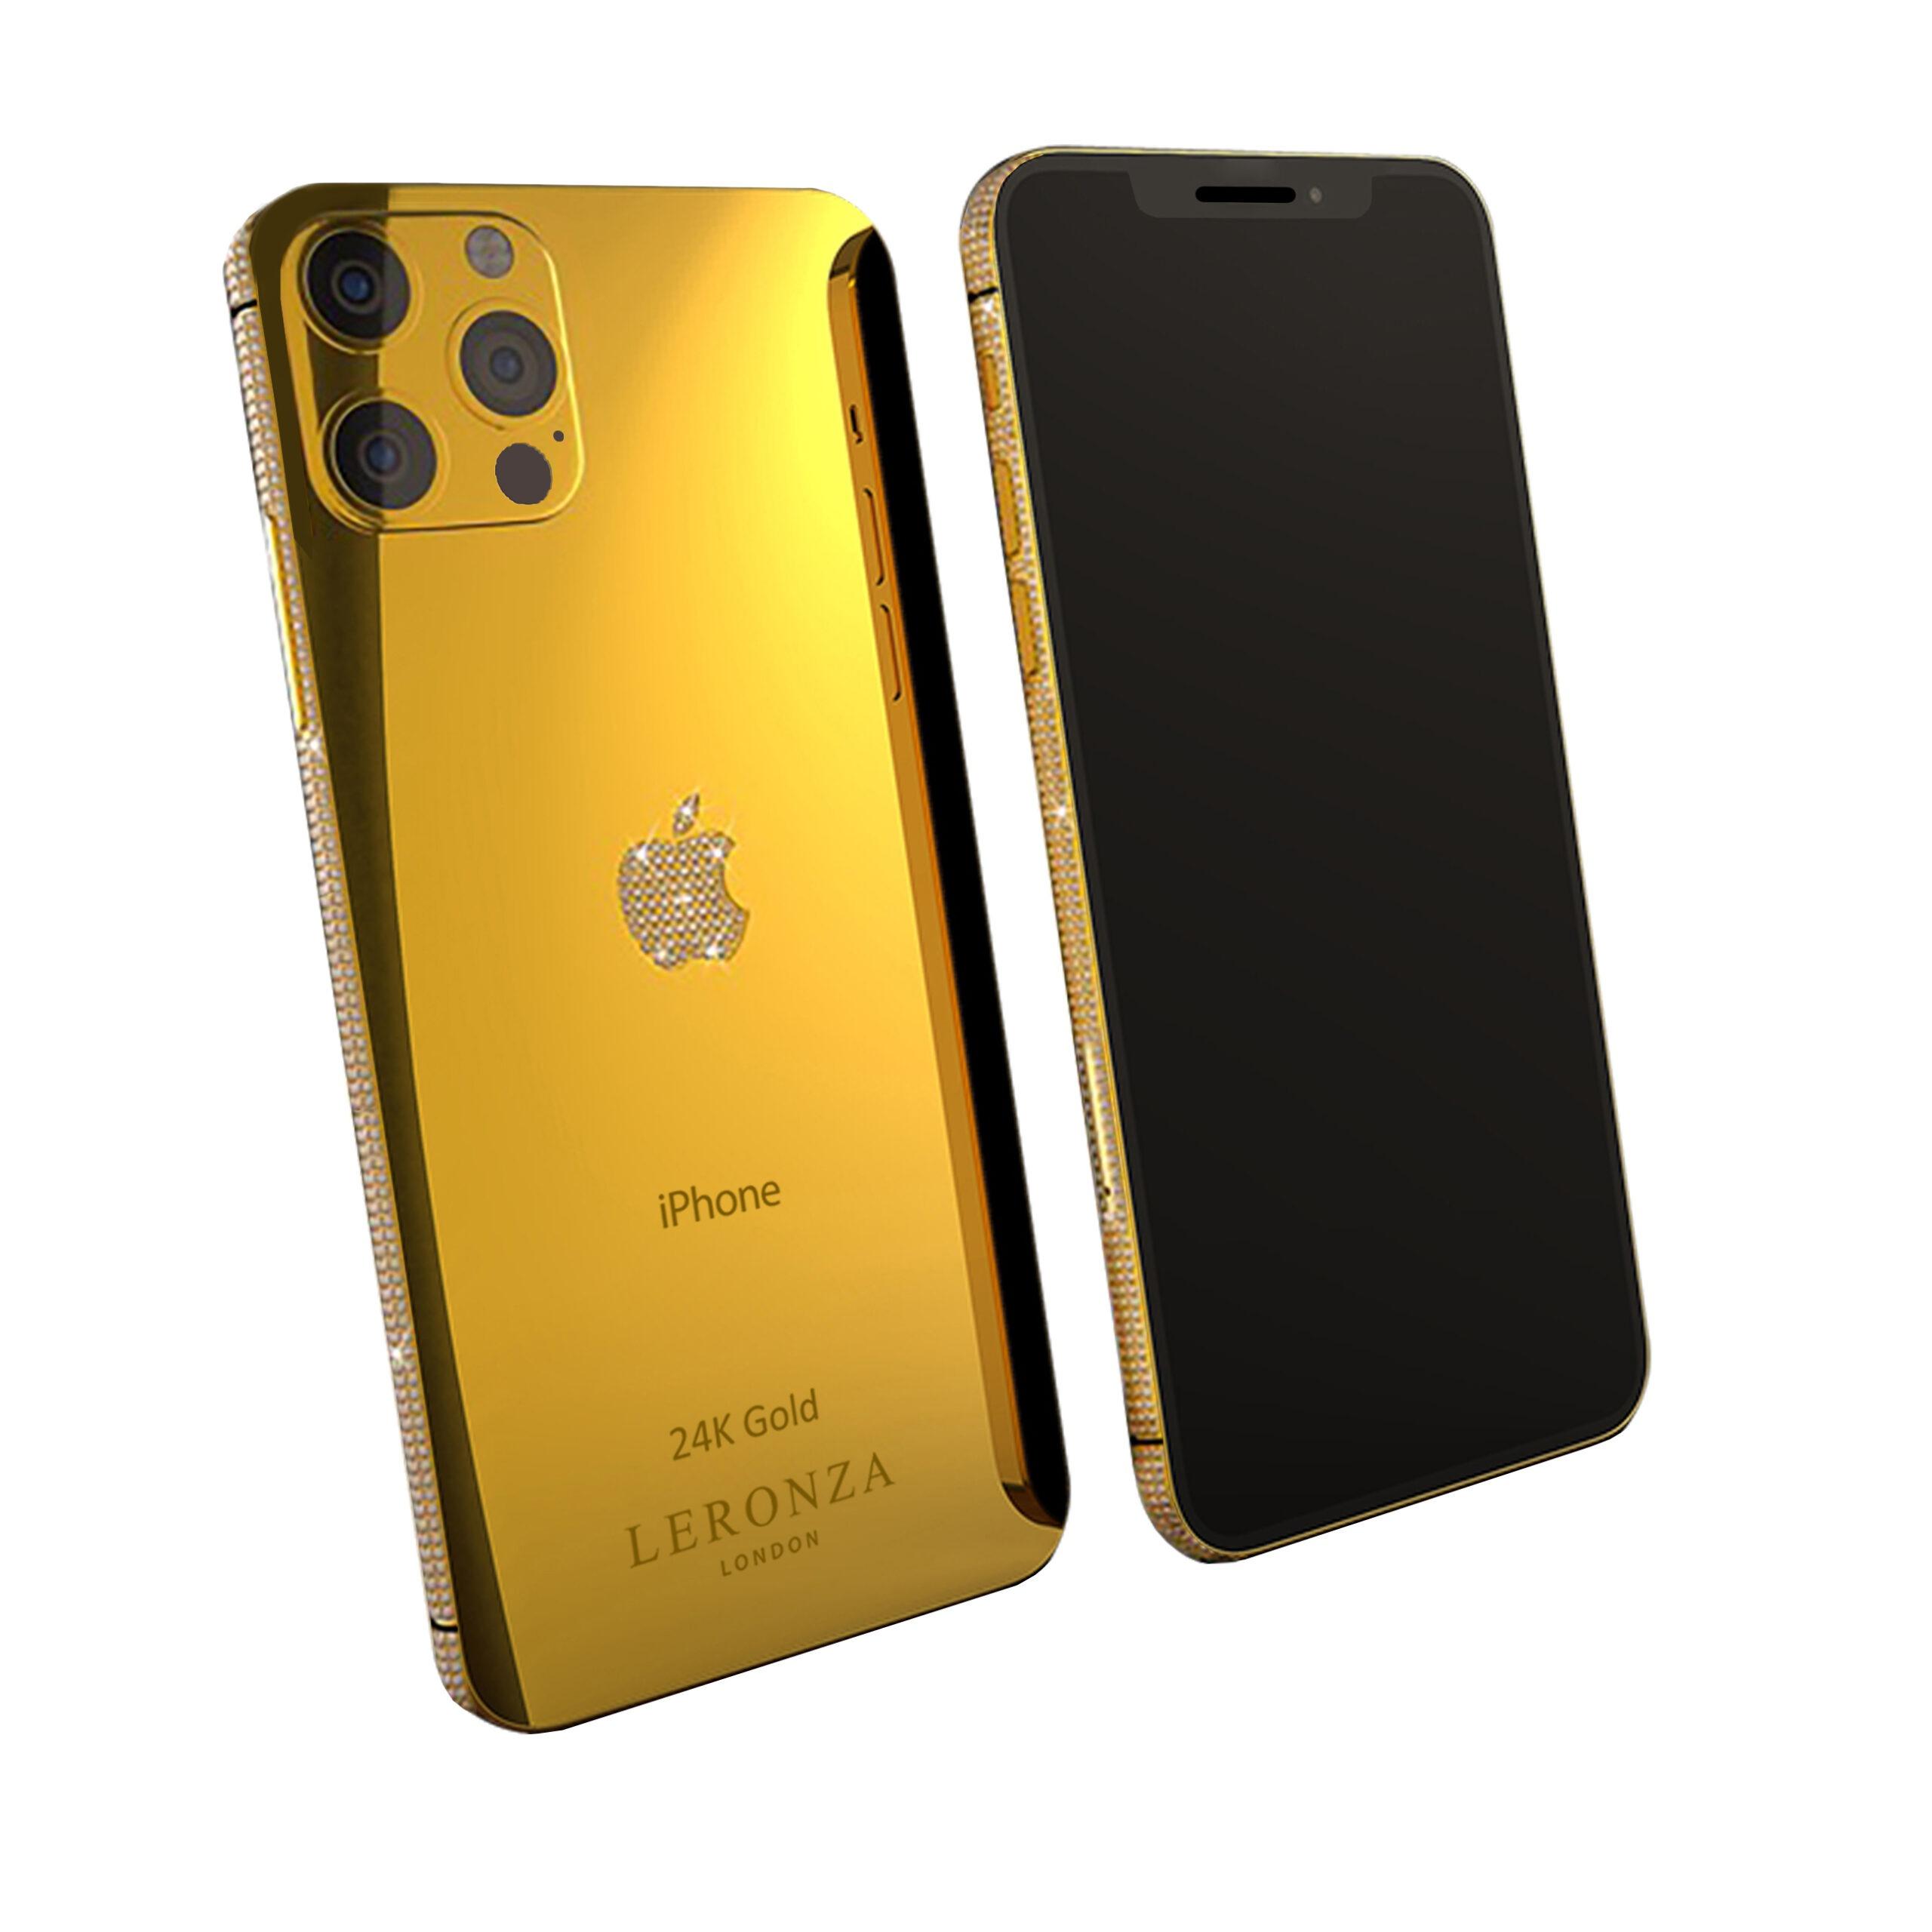 New Luxury 24k Gold Swarovski Brilliance iPhone 12 Pro and ...